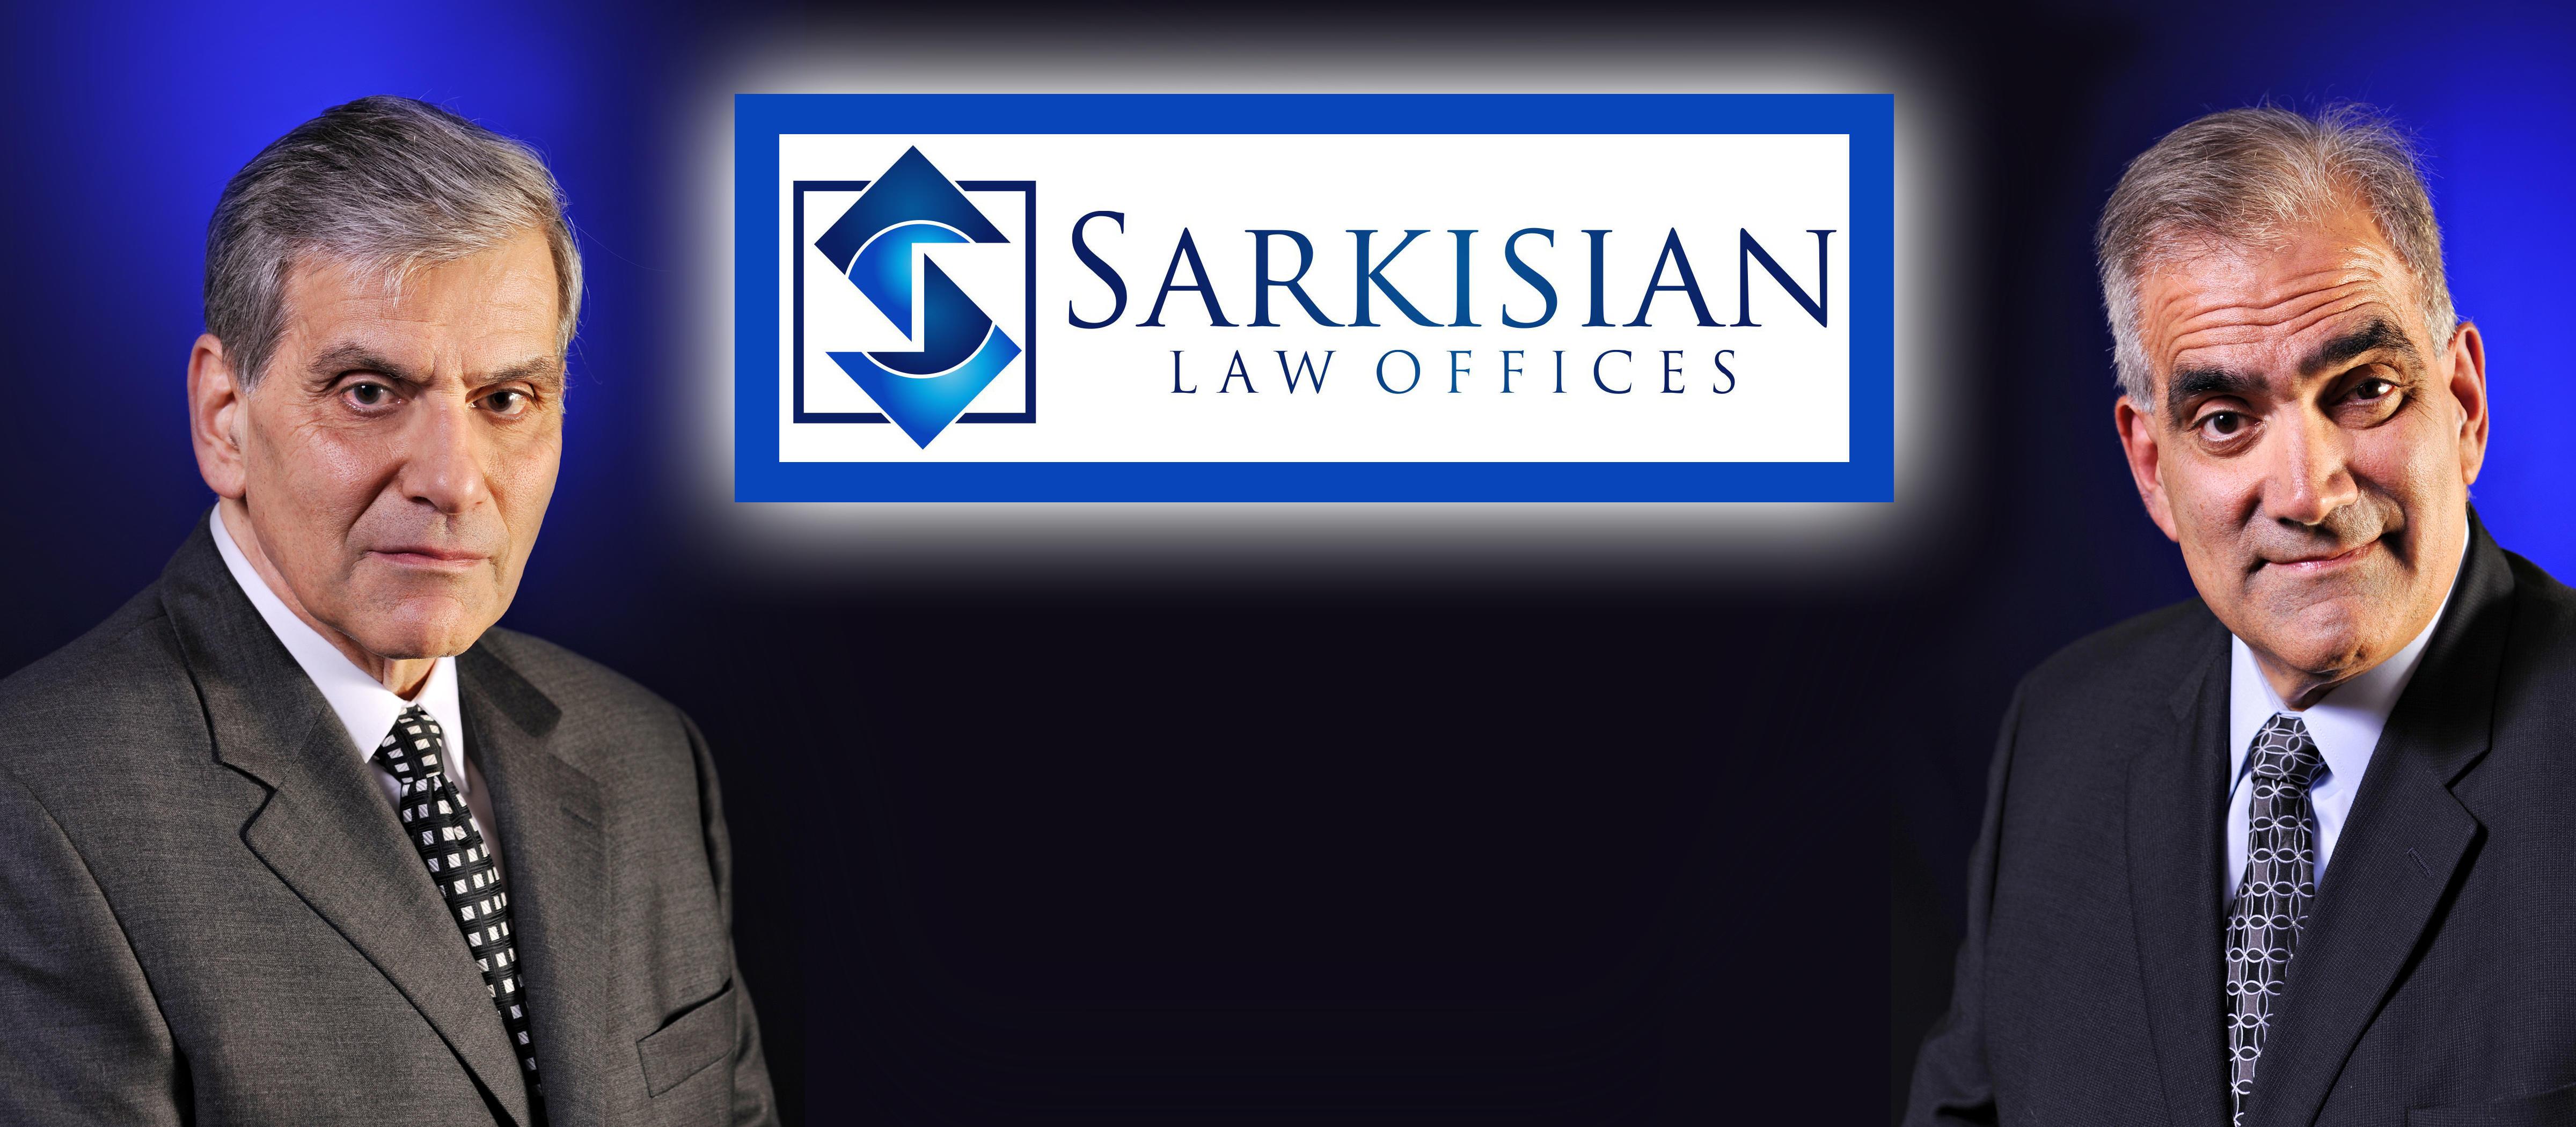 Sarkisian Personal Injury Lawyers